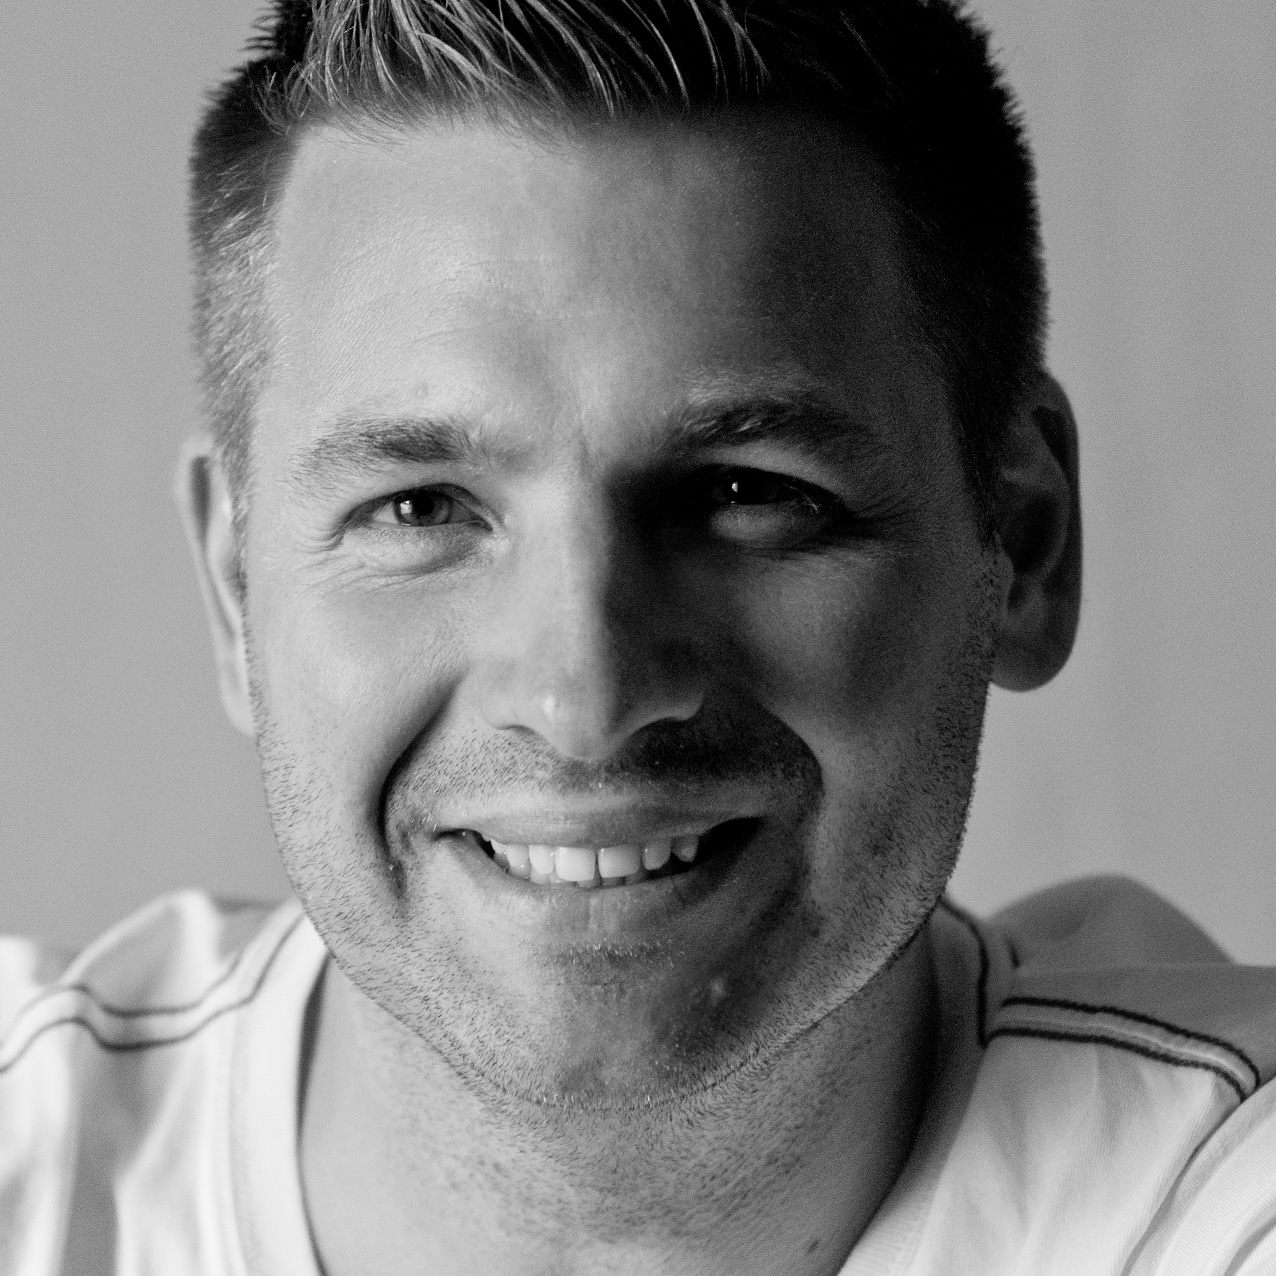 Jiři-David Maagh Assistent des Geschäftsführers